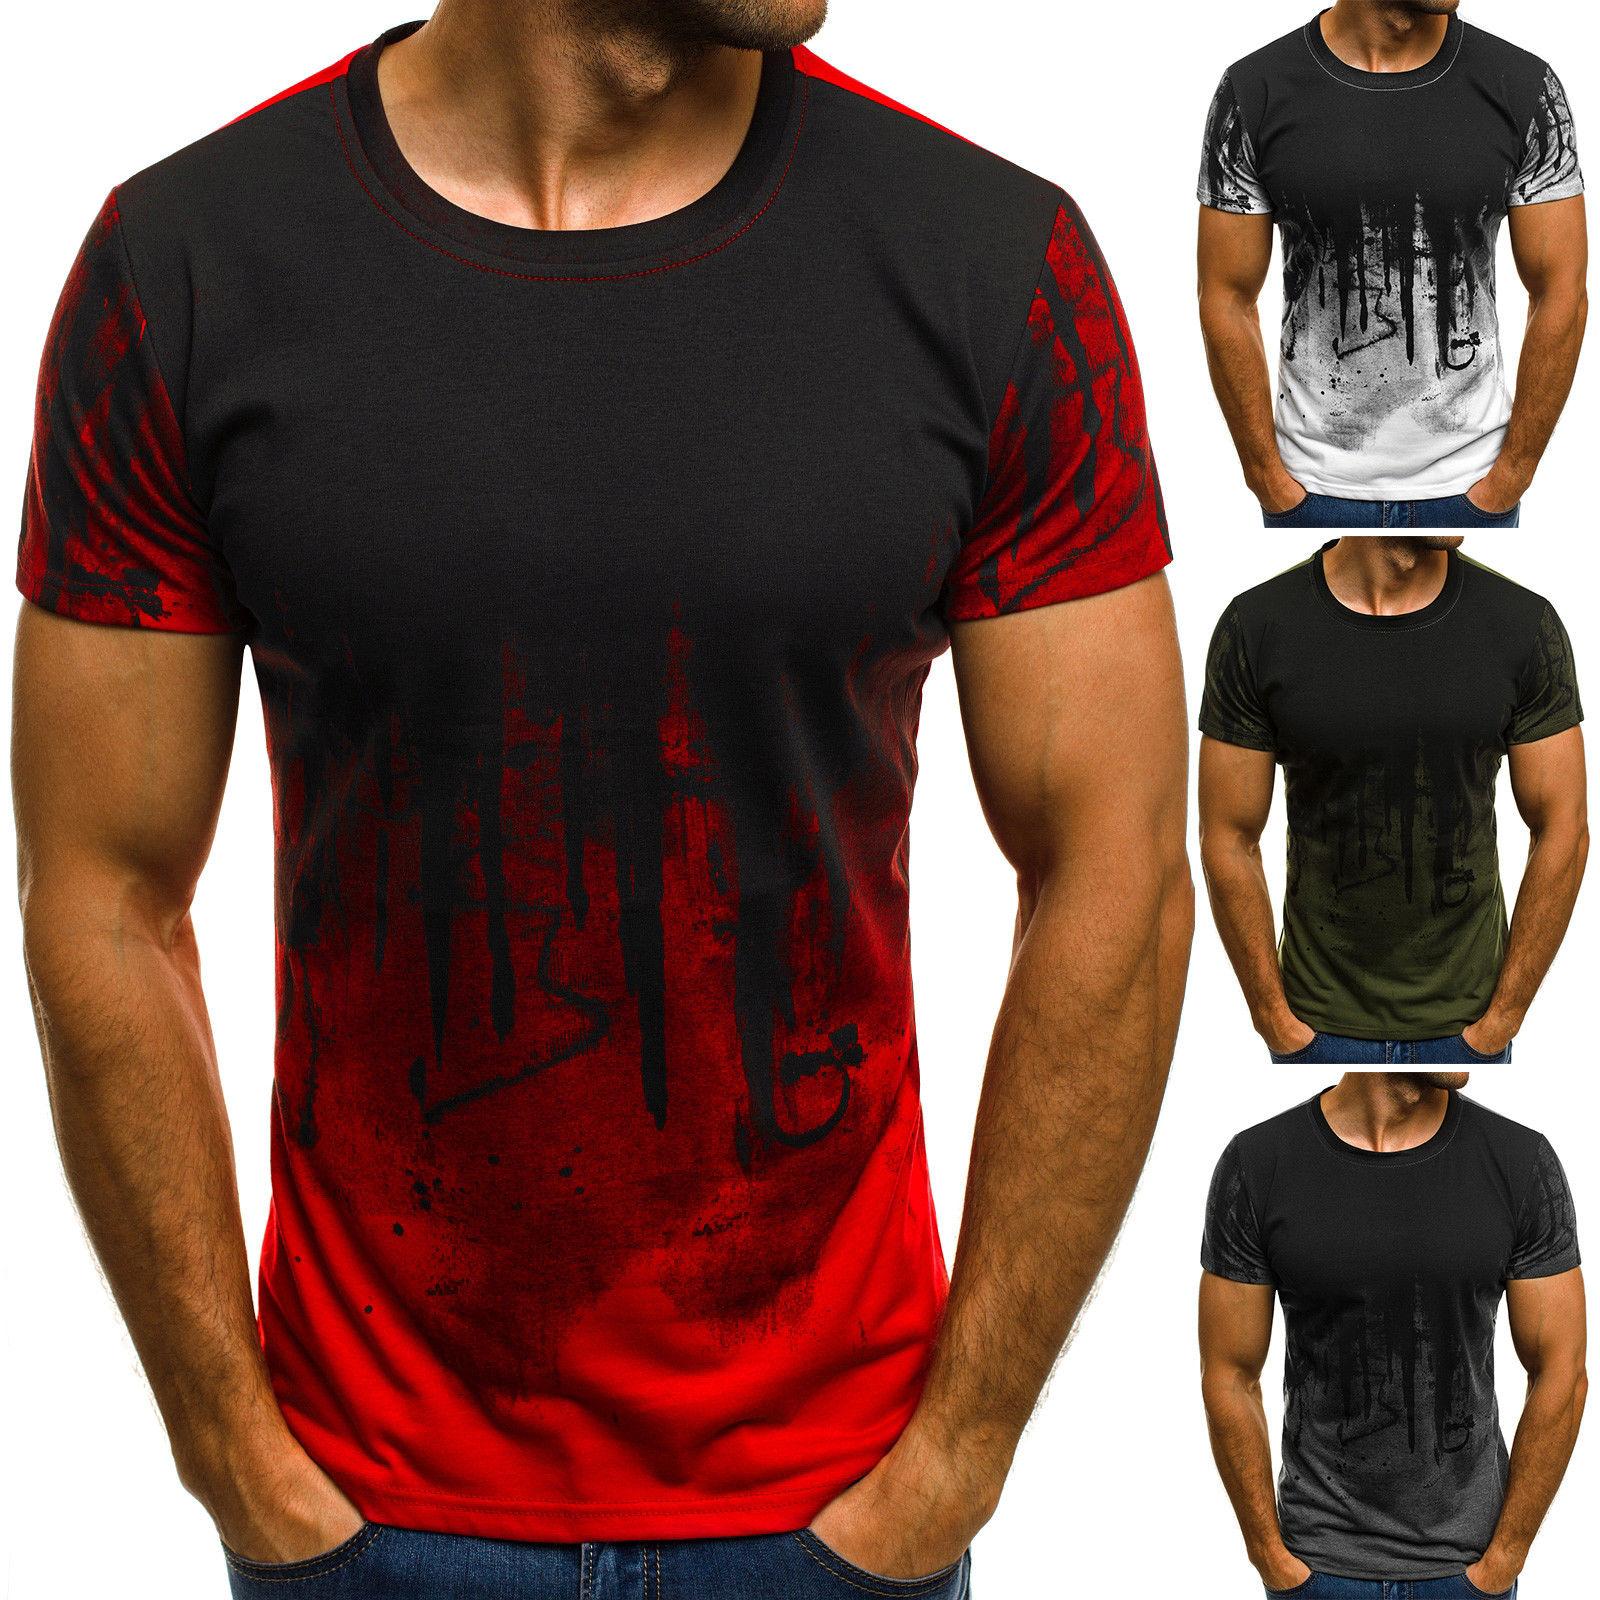 2018 fashion street wear t shirt men t shirt Super Long line Long Sleeve T-Shirt With Fitness camouflage short sleeved T - shirt